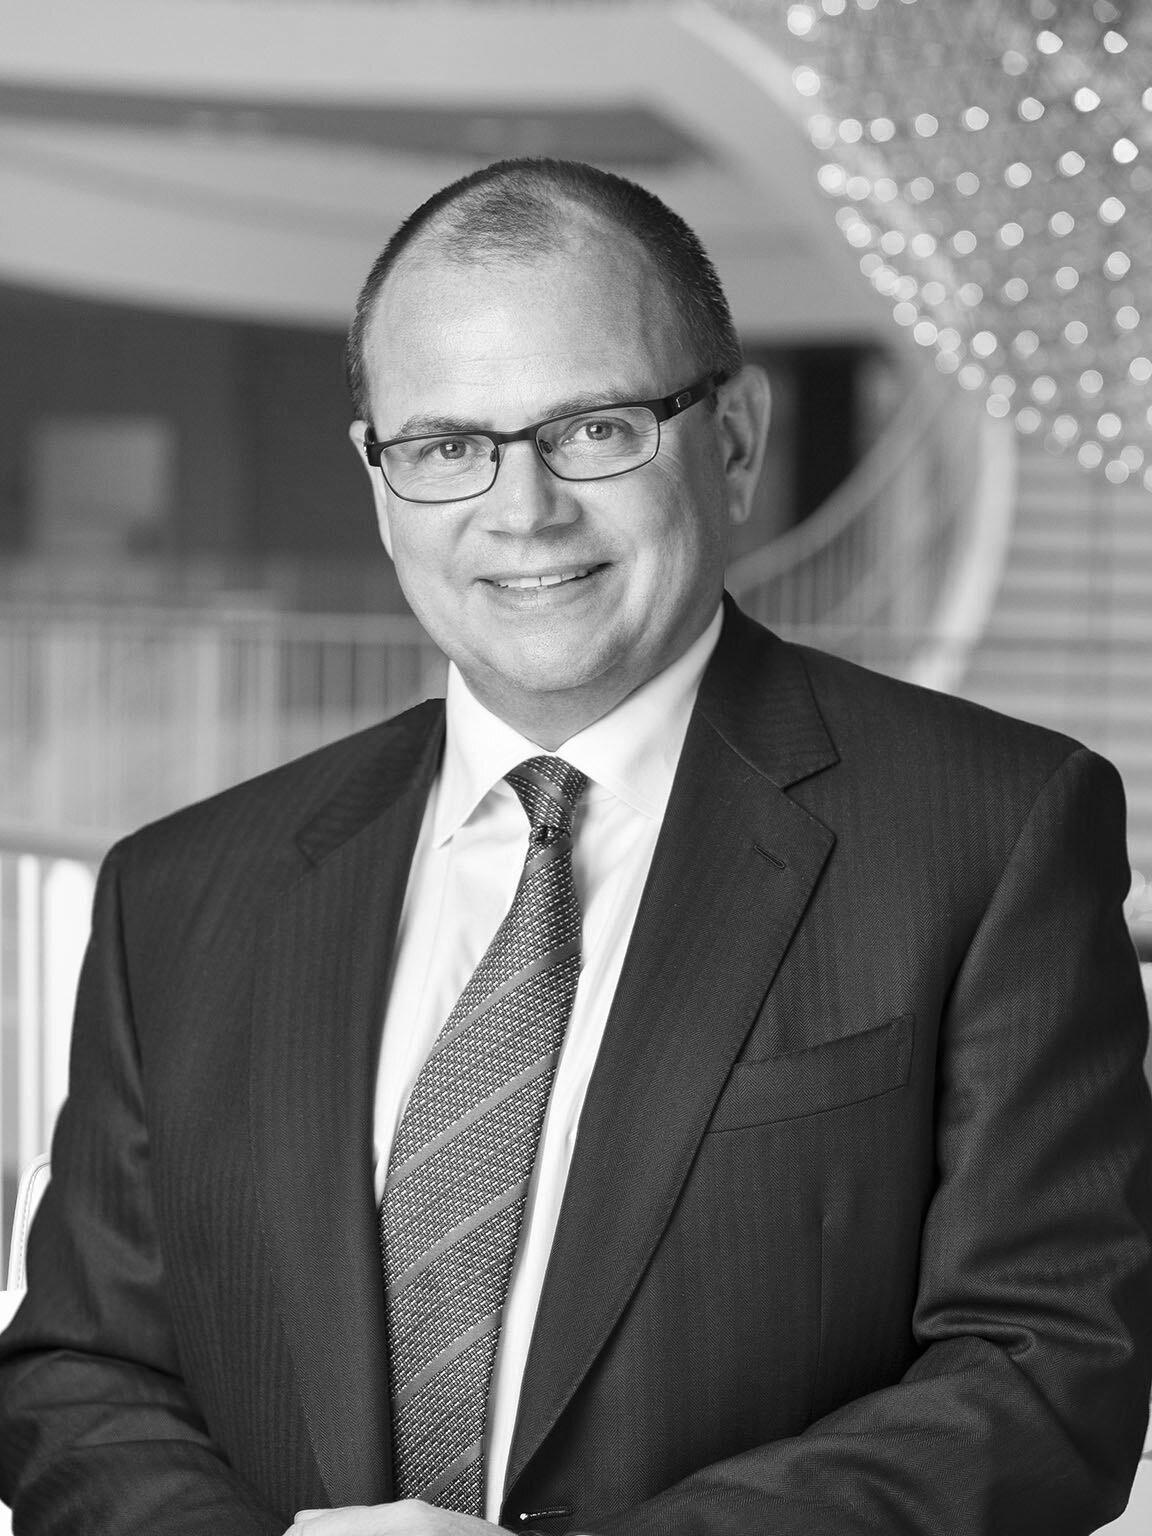 HENRIK ANDERSEN  CEO, VESTAS  TRACK: CREATIVE SKILLS, CREATIVE ORGANISATIONS